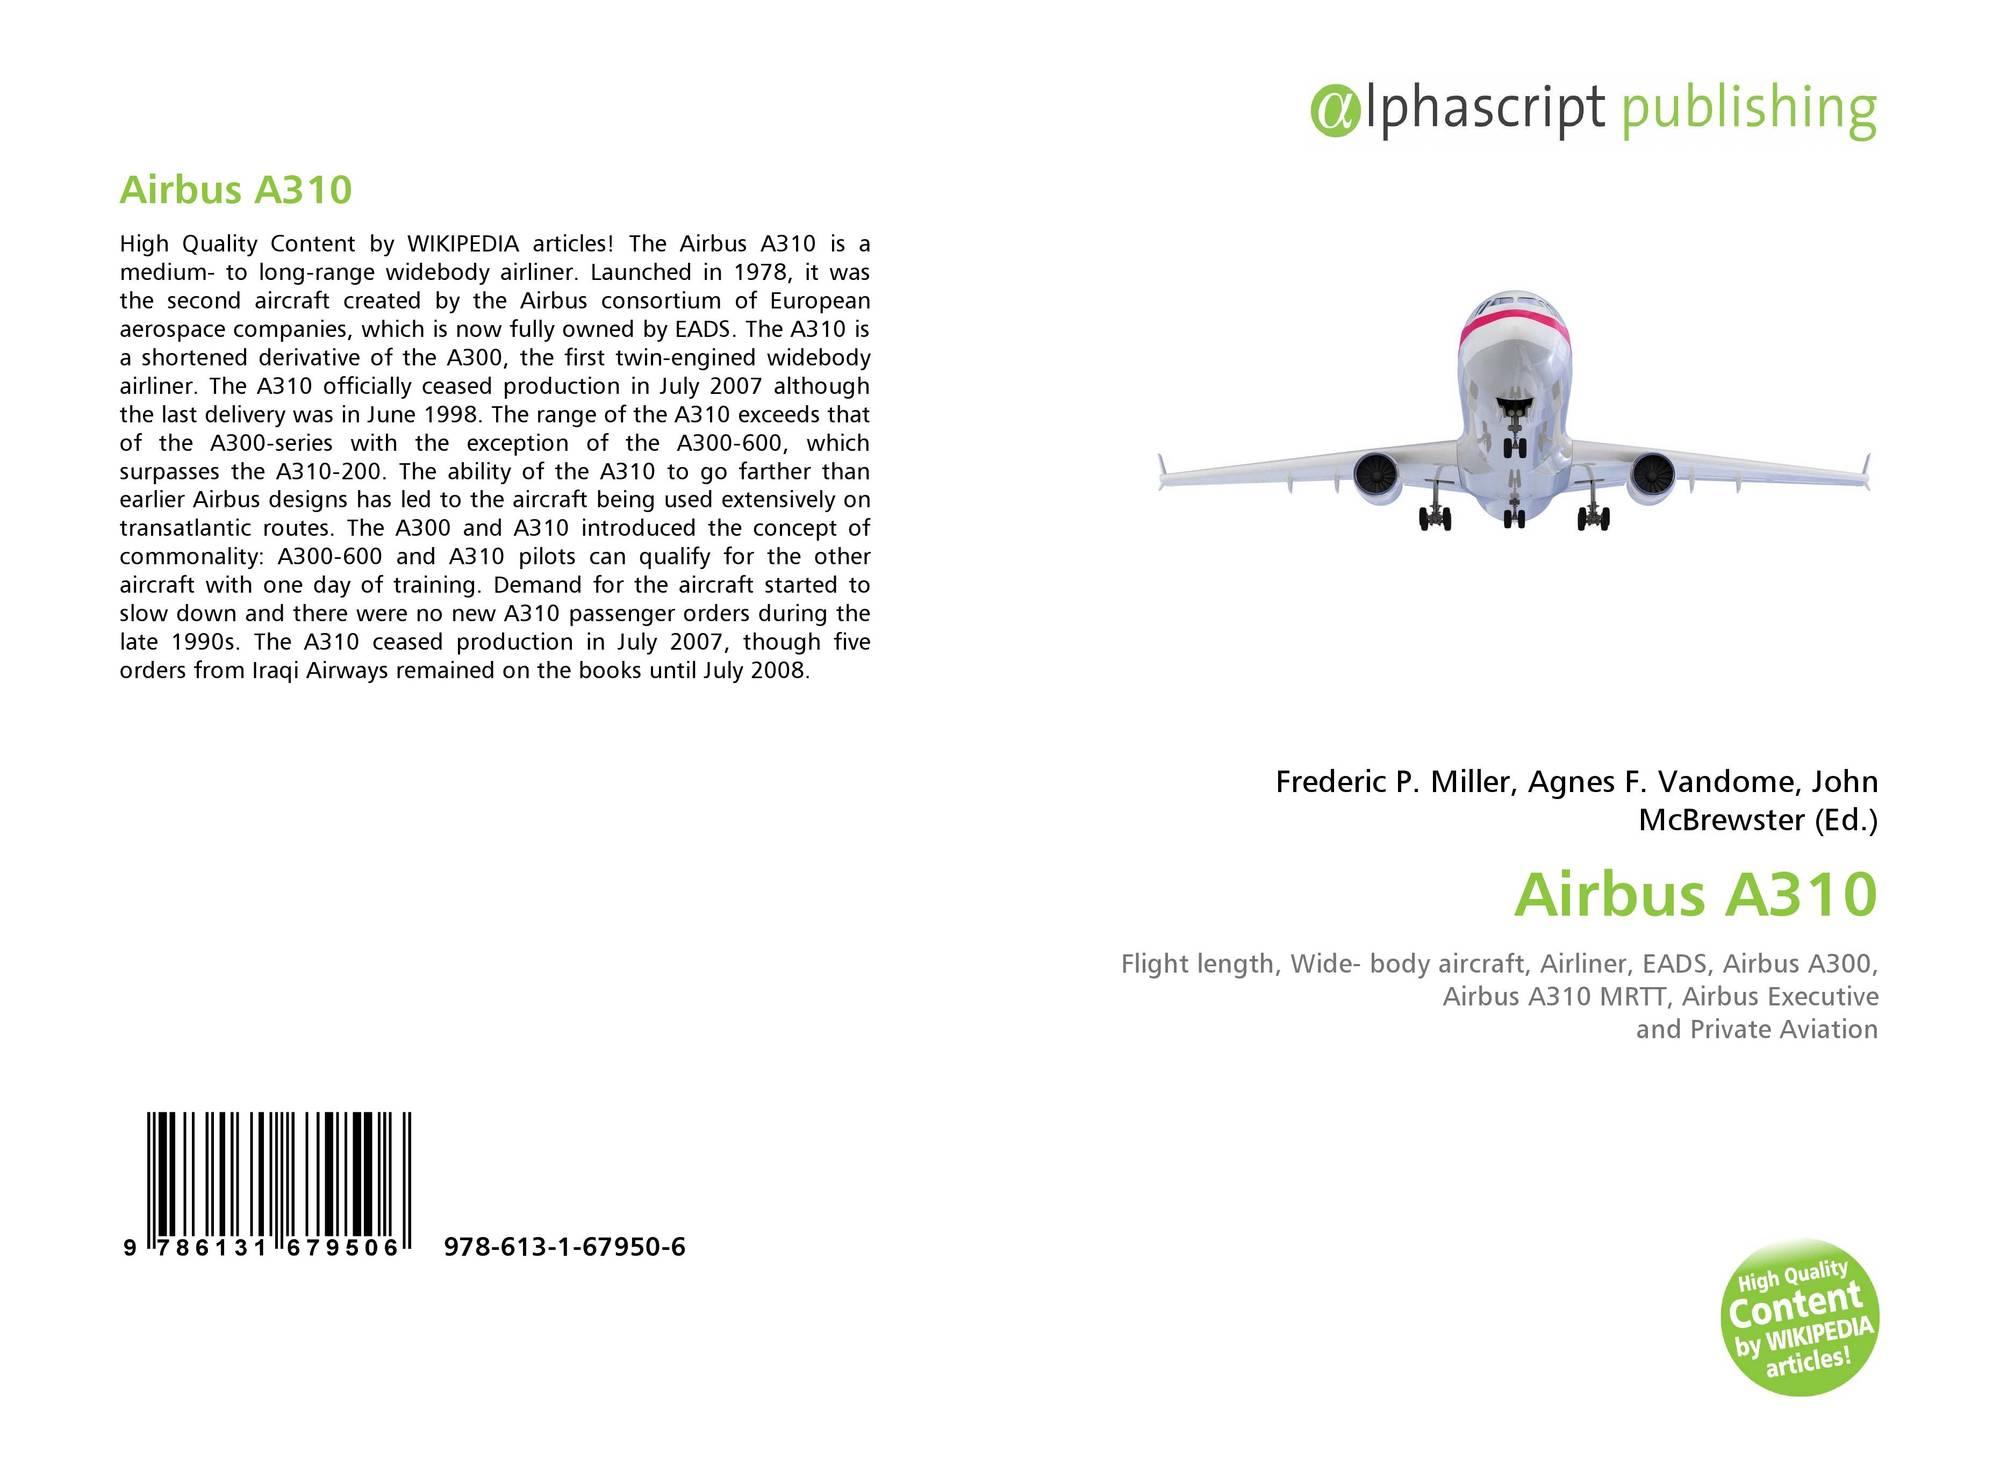 Airbus A310, 978-613-1-67950-6, 6131679509 ,9786131679506